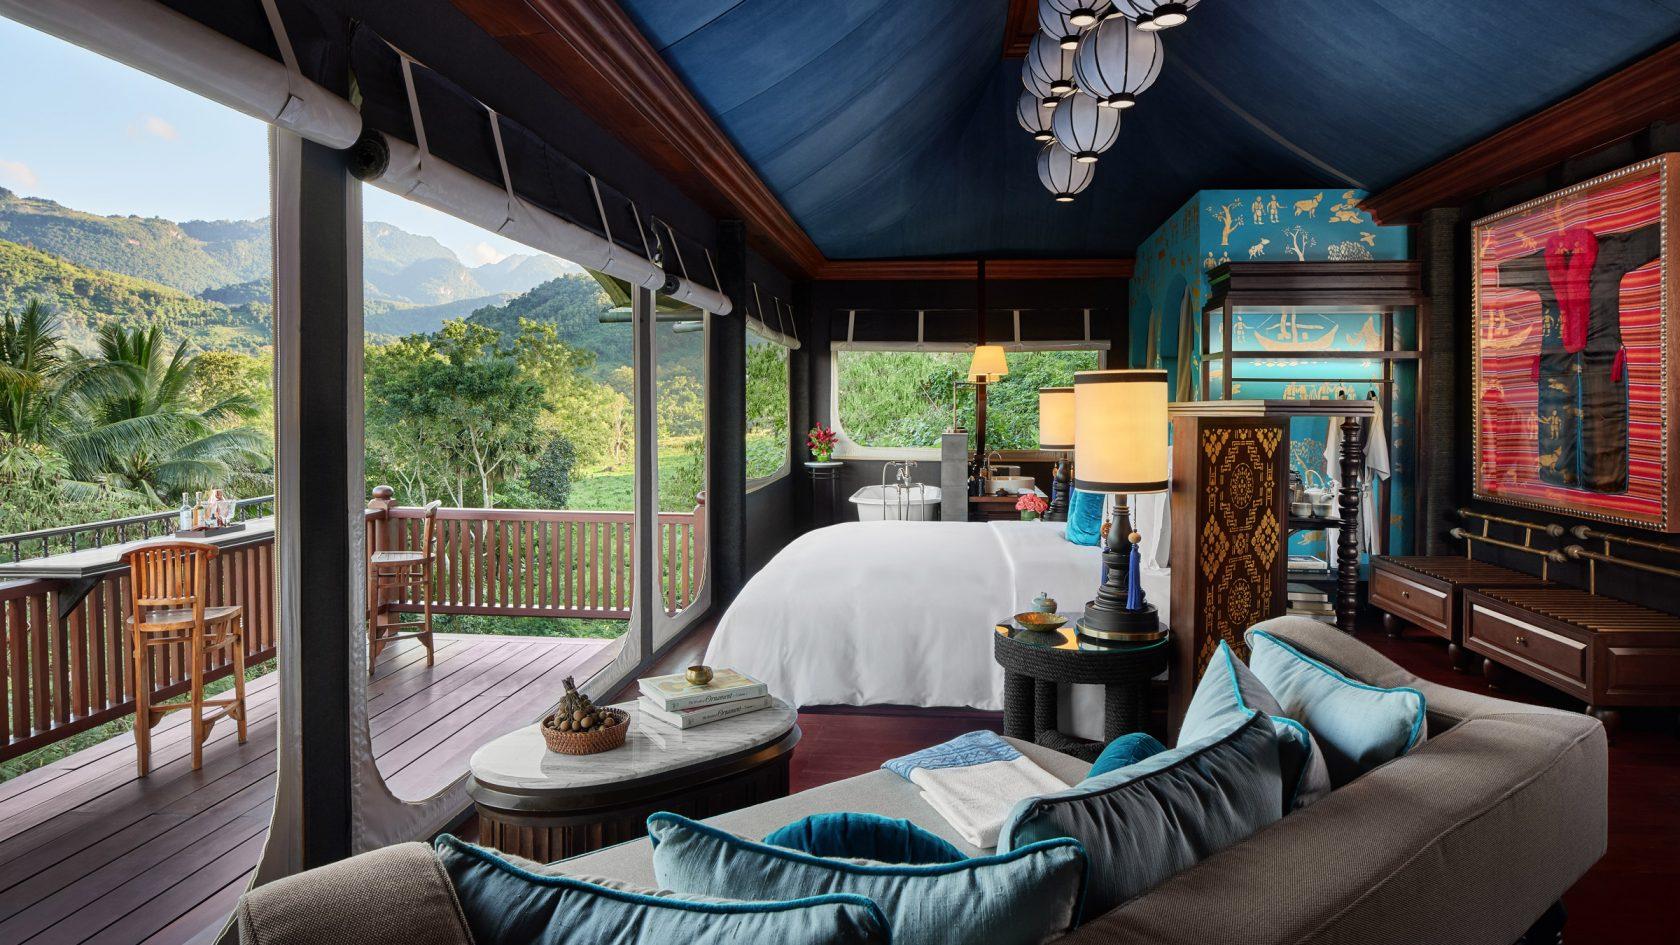 Luxushotels buchen – Rosewood Hotels & Resorts